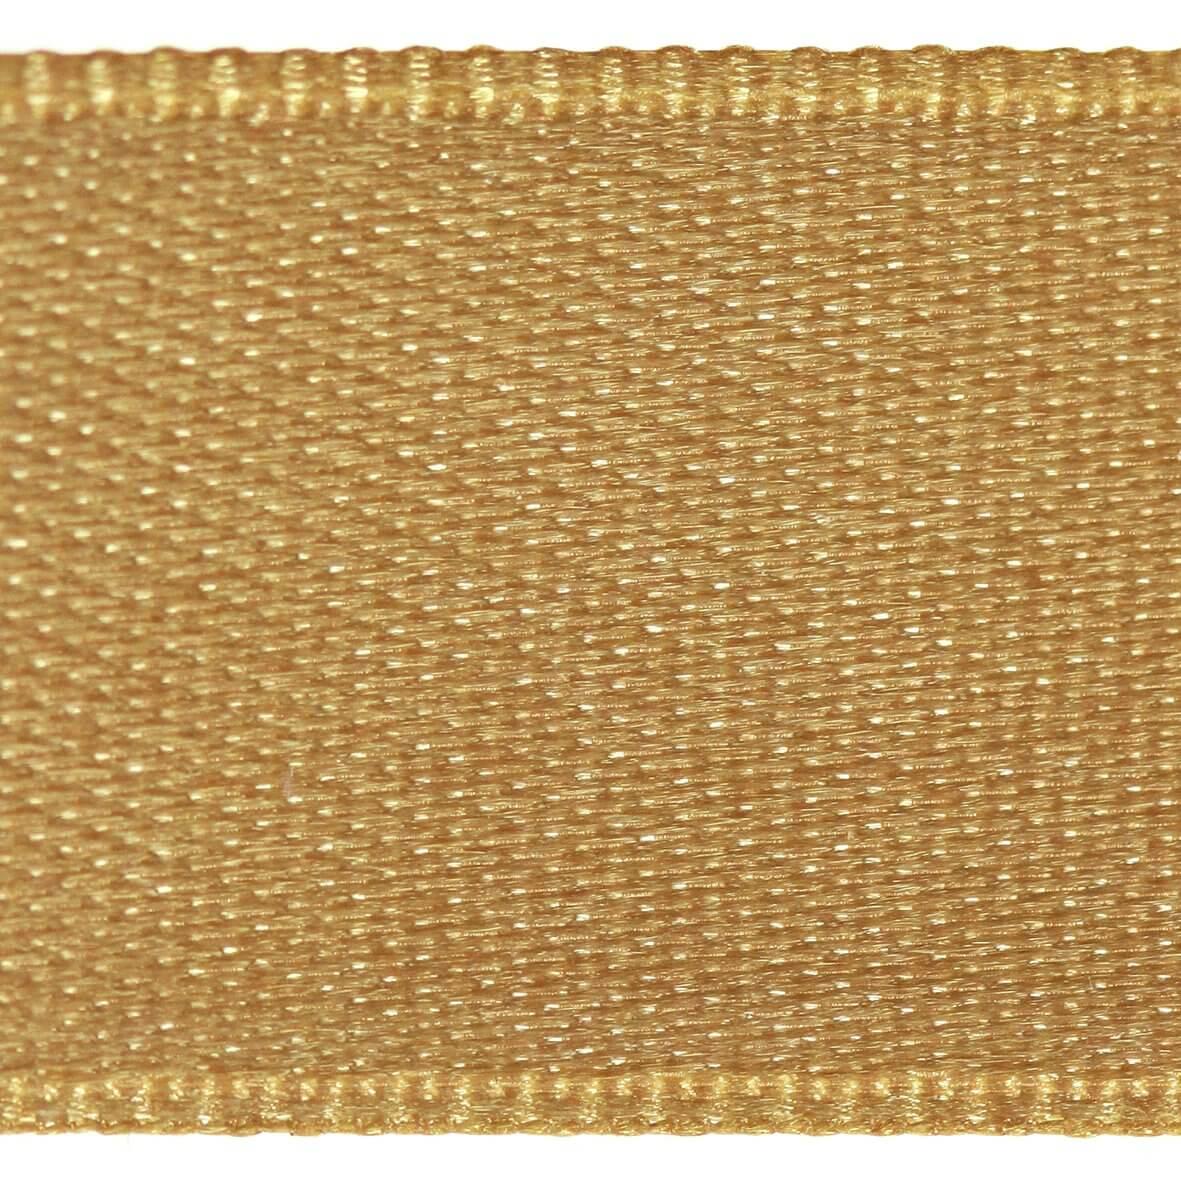 Goldrush Col. 304 - 25mm Satab Satin Ribbon